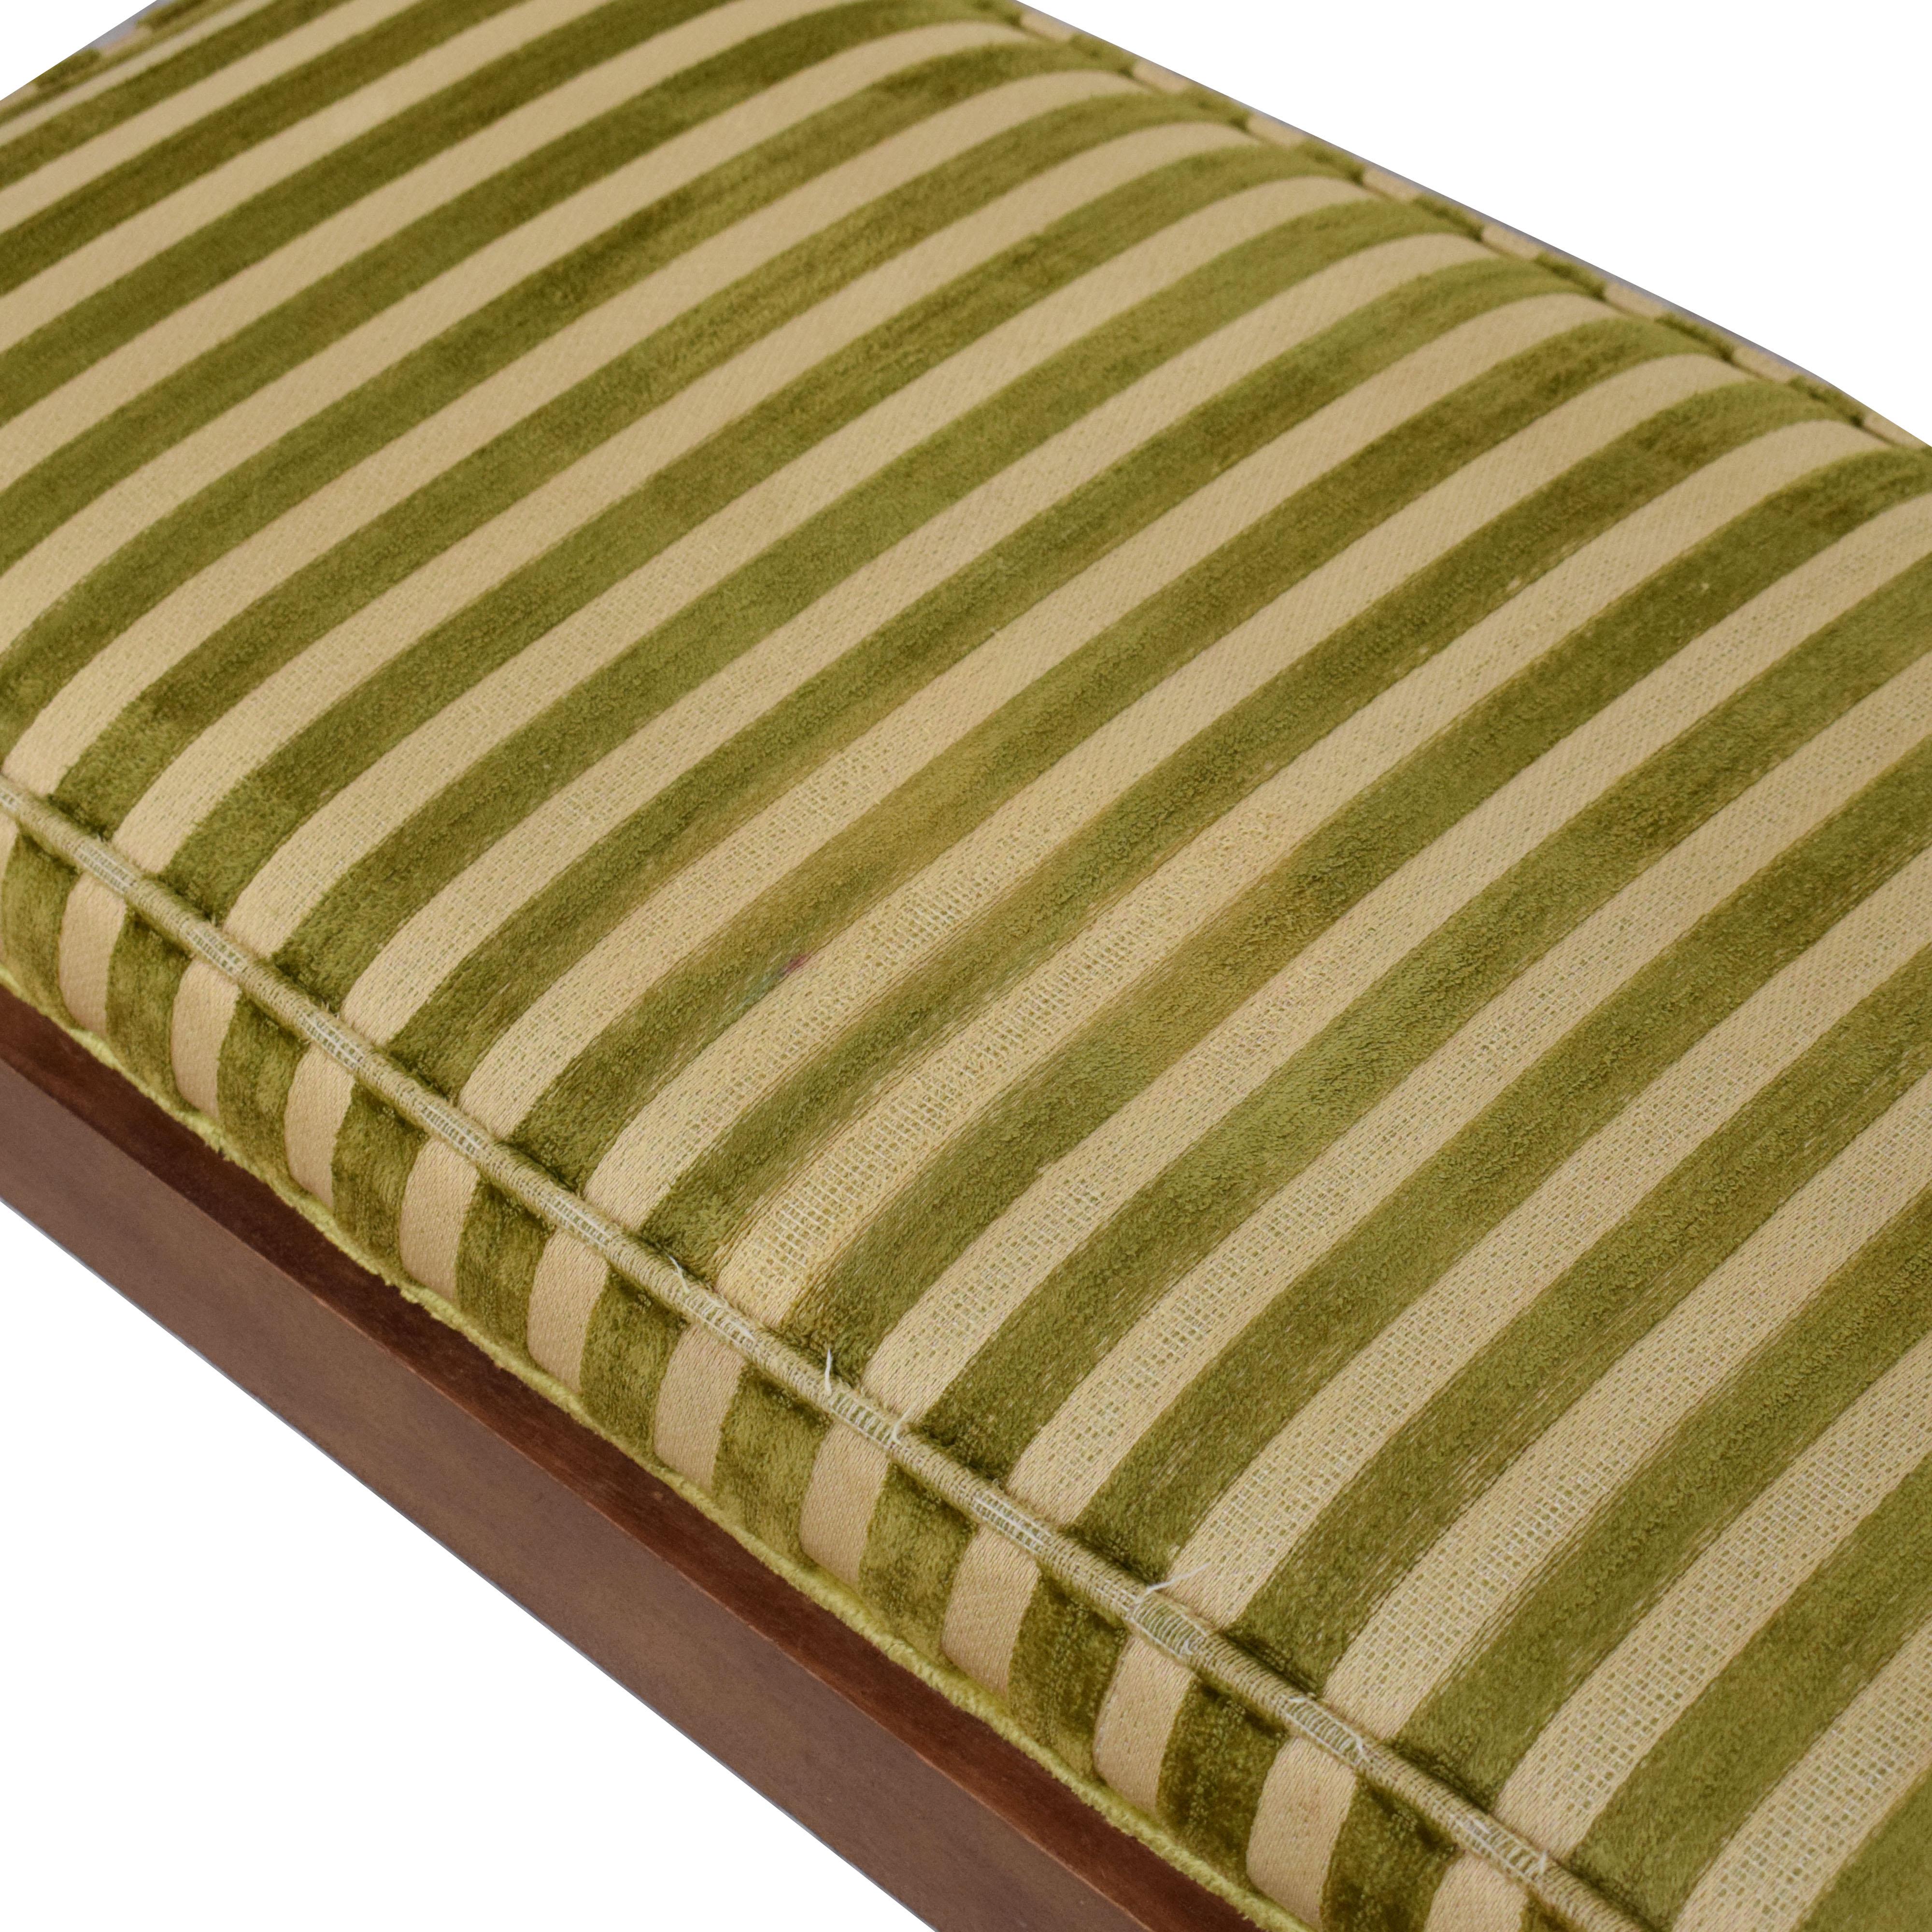 Drexel Vintage Drexel Cushioned Bench ma